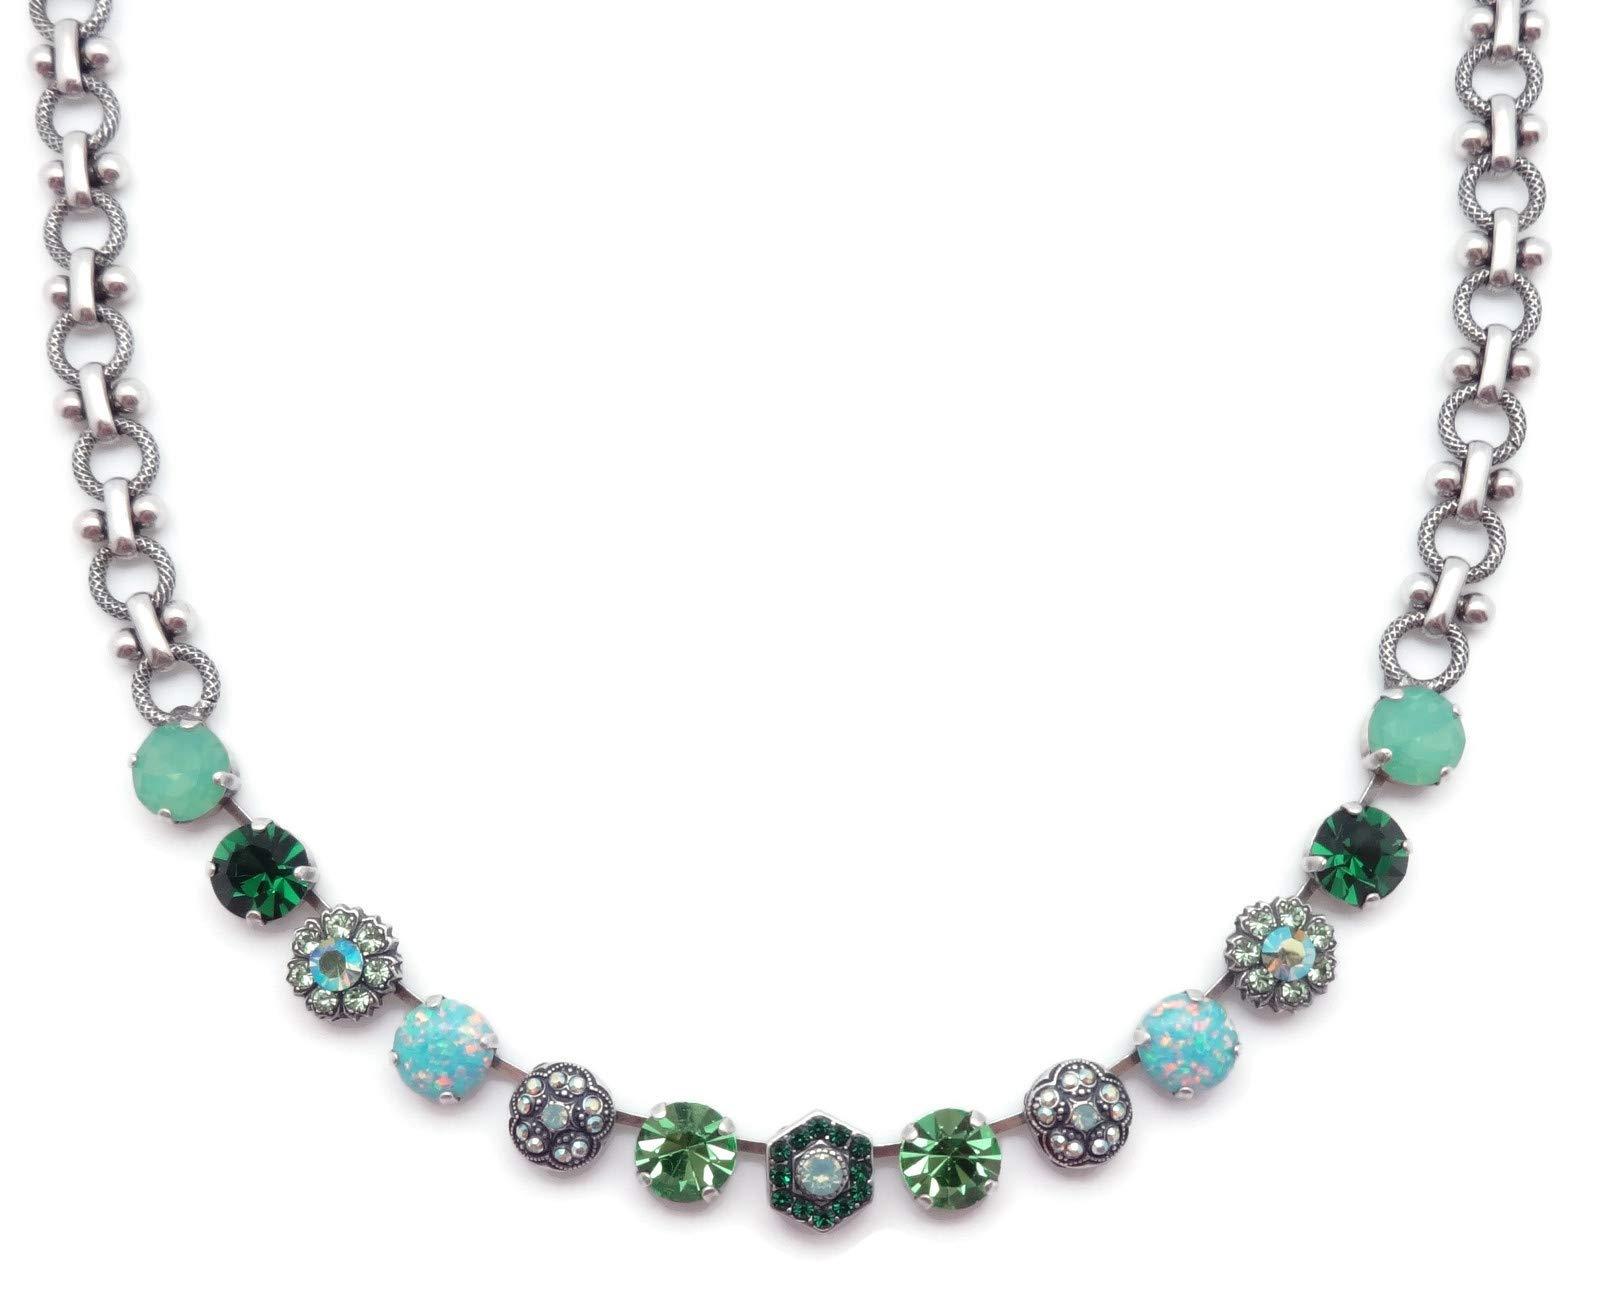 Mariana Fern Swarovski Crystal Silvertone Necklace Green & Green Opalescent Mix Mosaic M2143 by Mariana